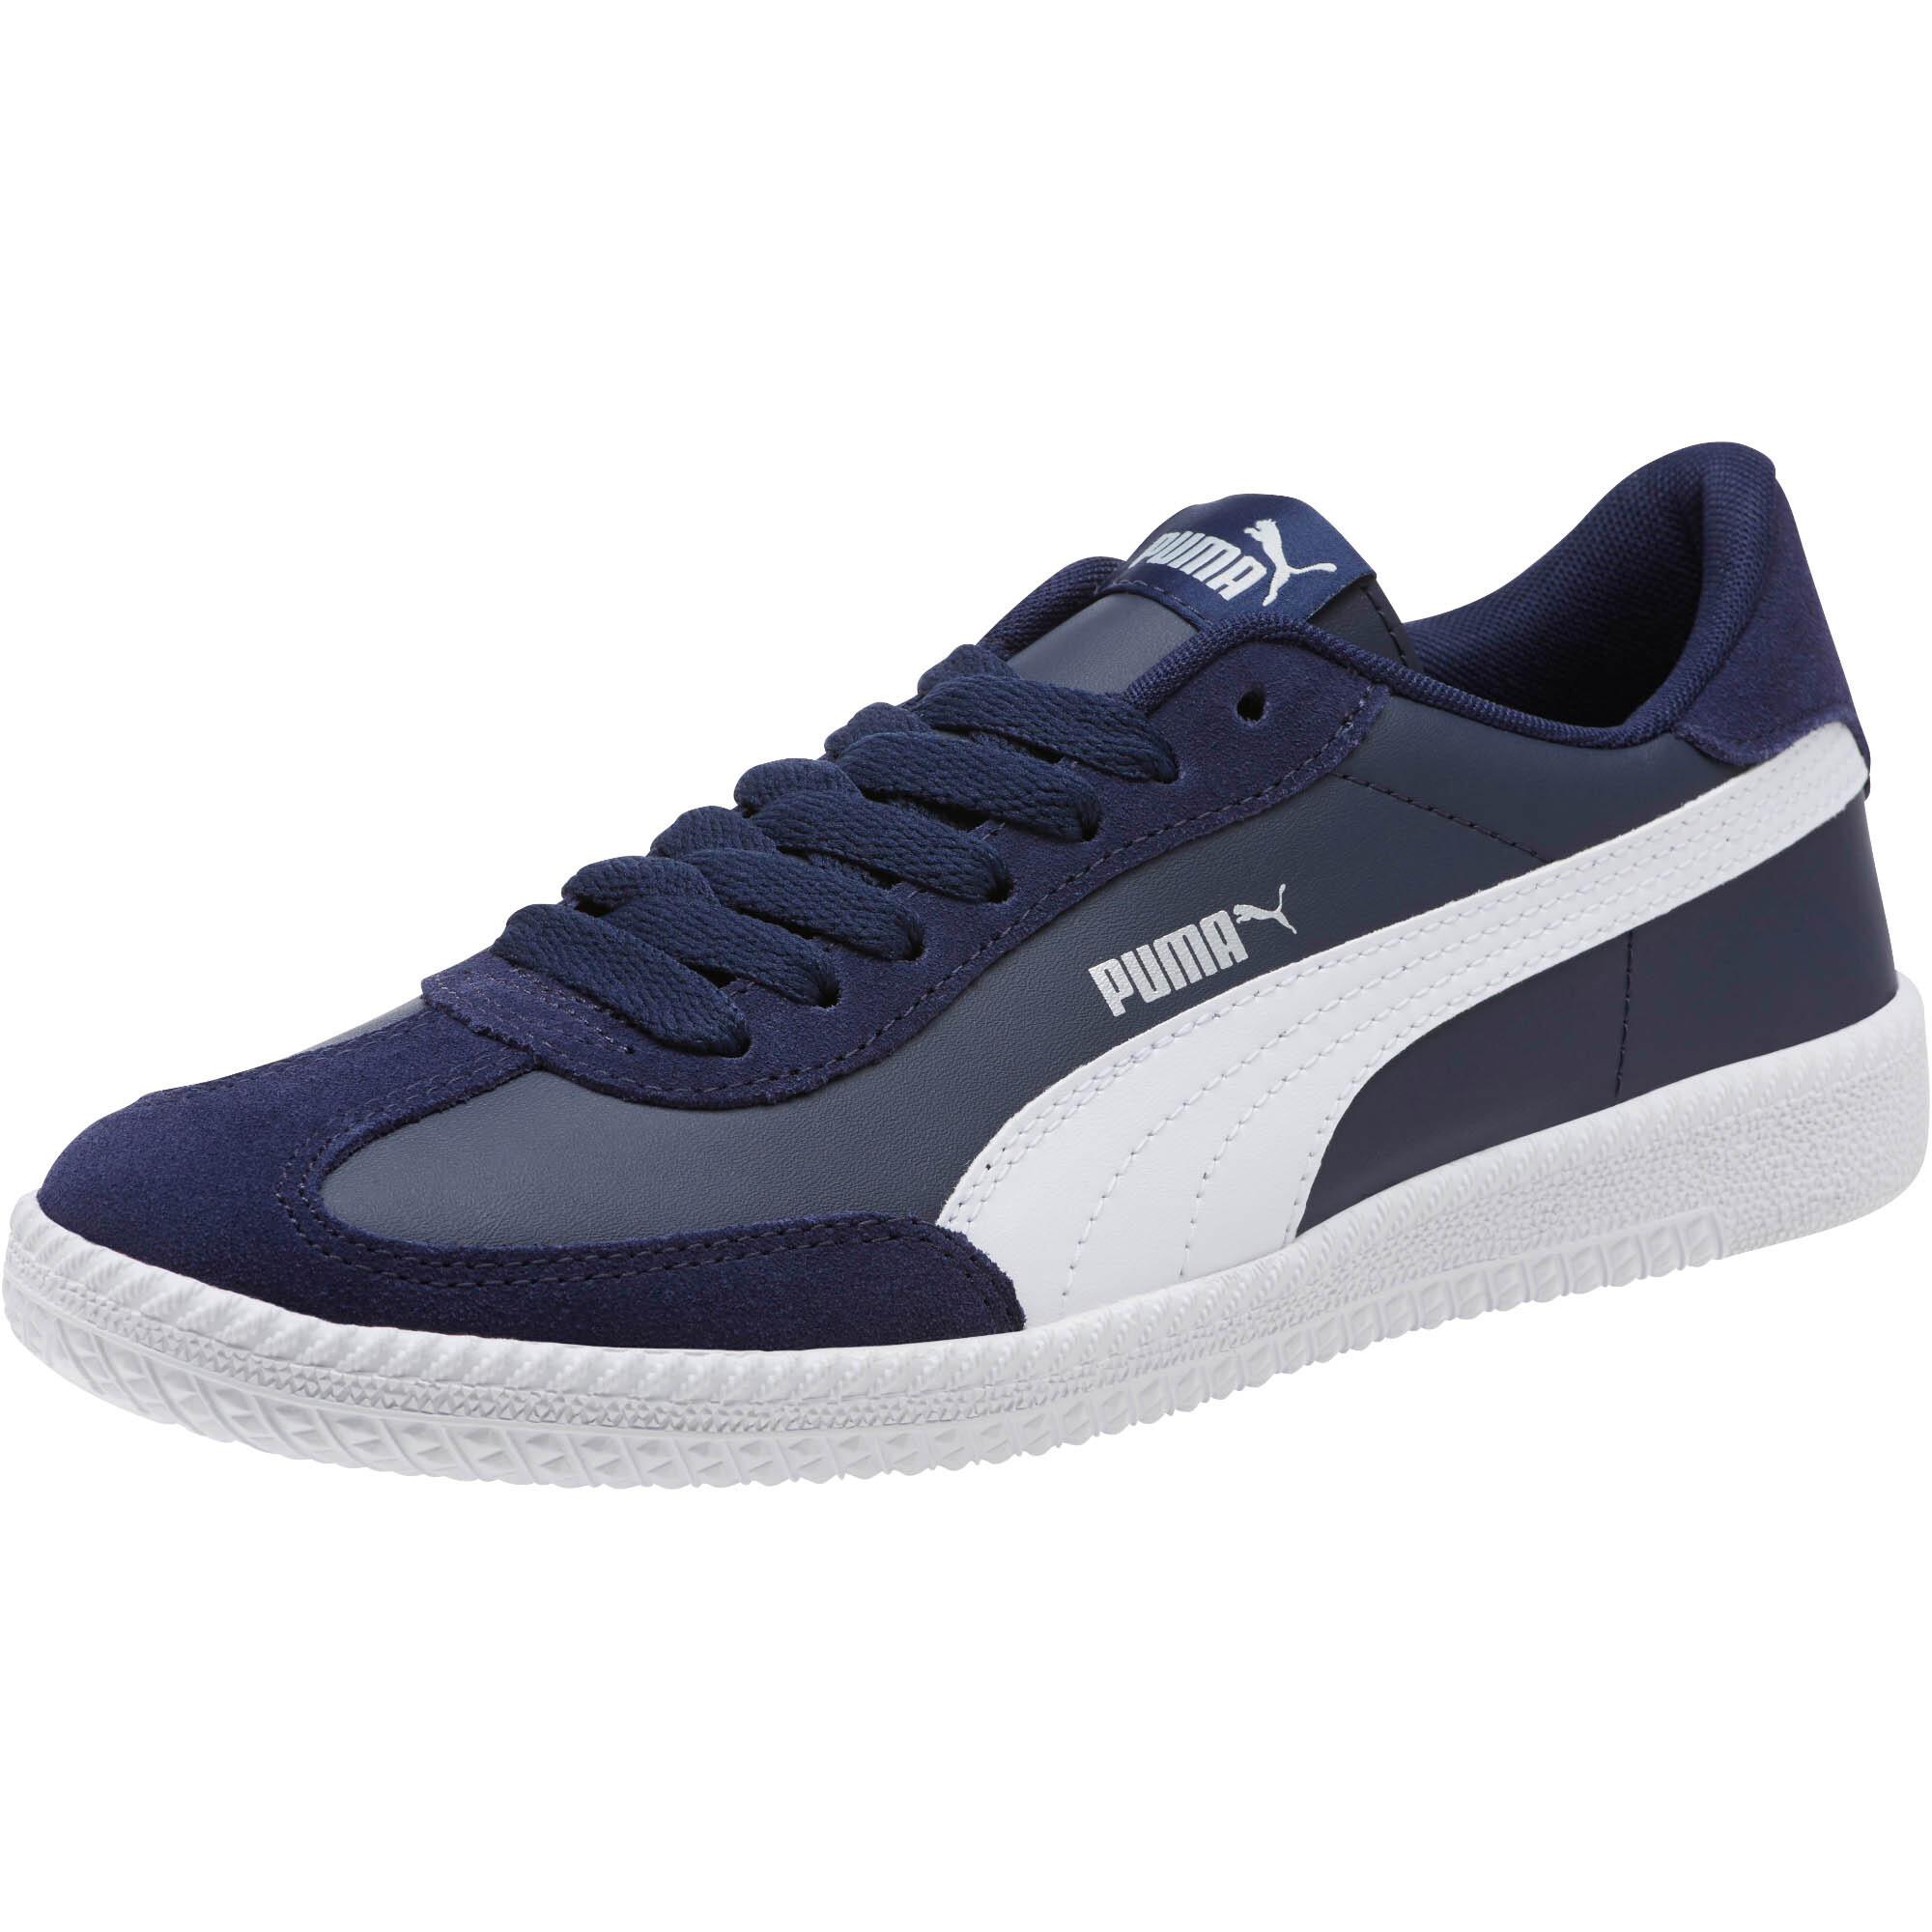 PUMA-Astro-Cup-Sneakers-Men-Shoe-Basics thumbnail 10